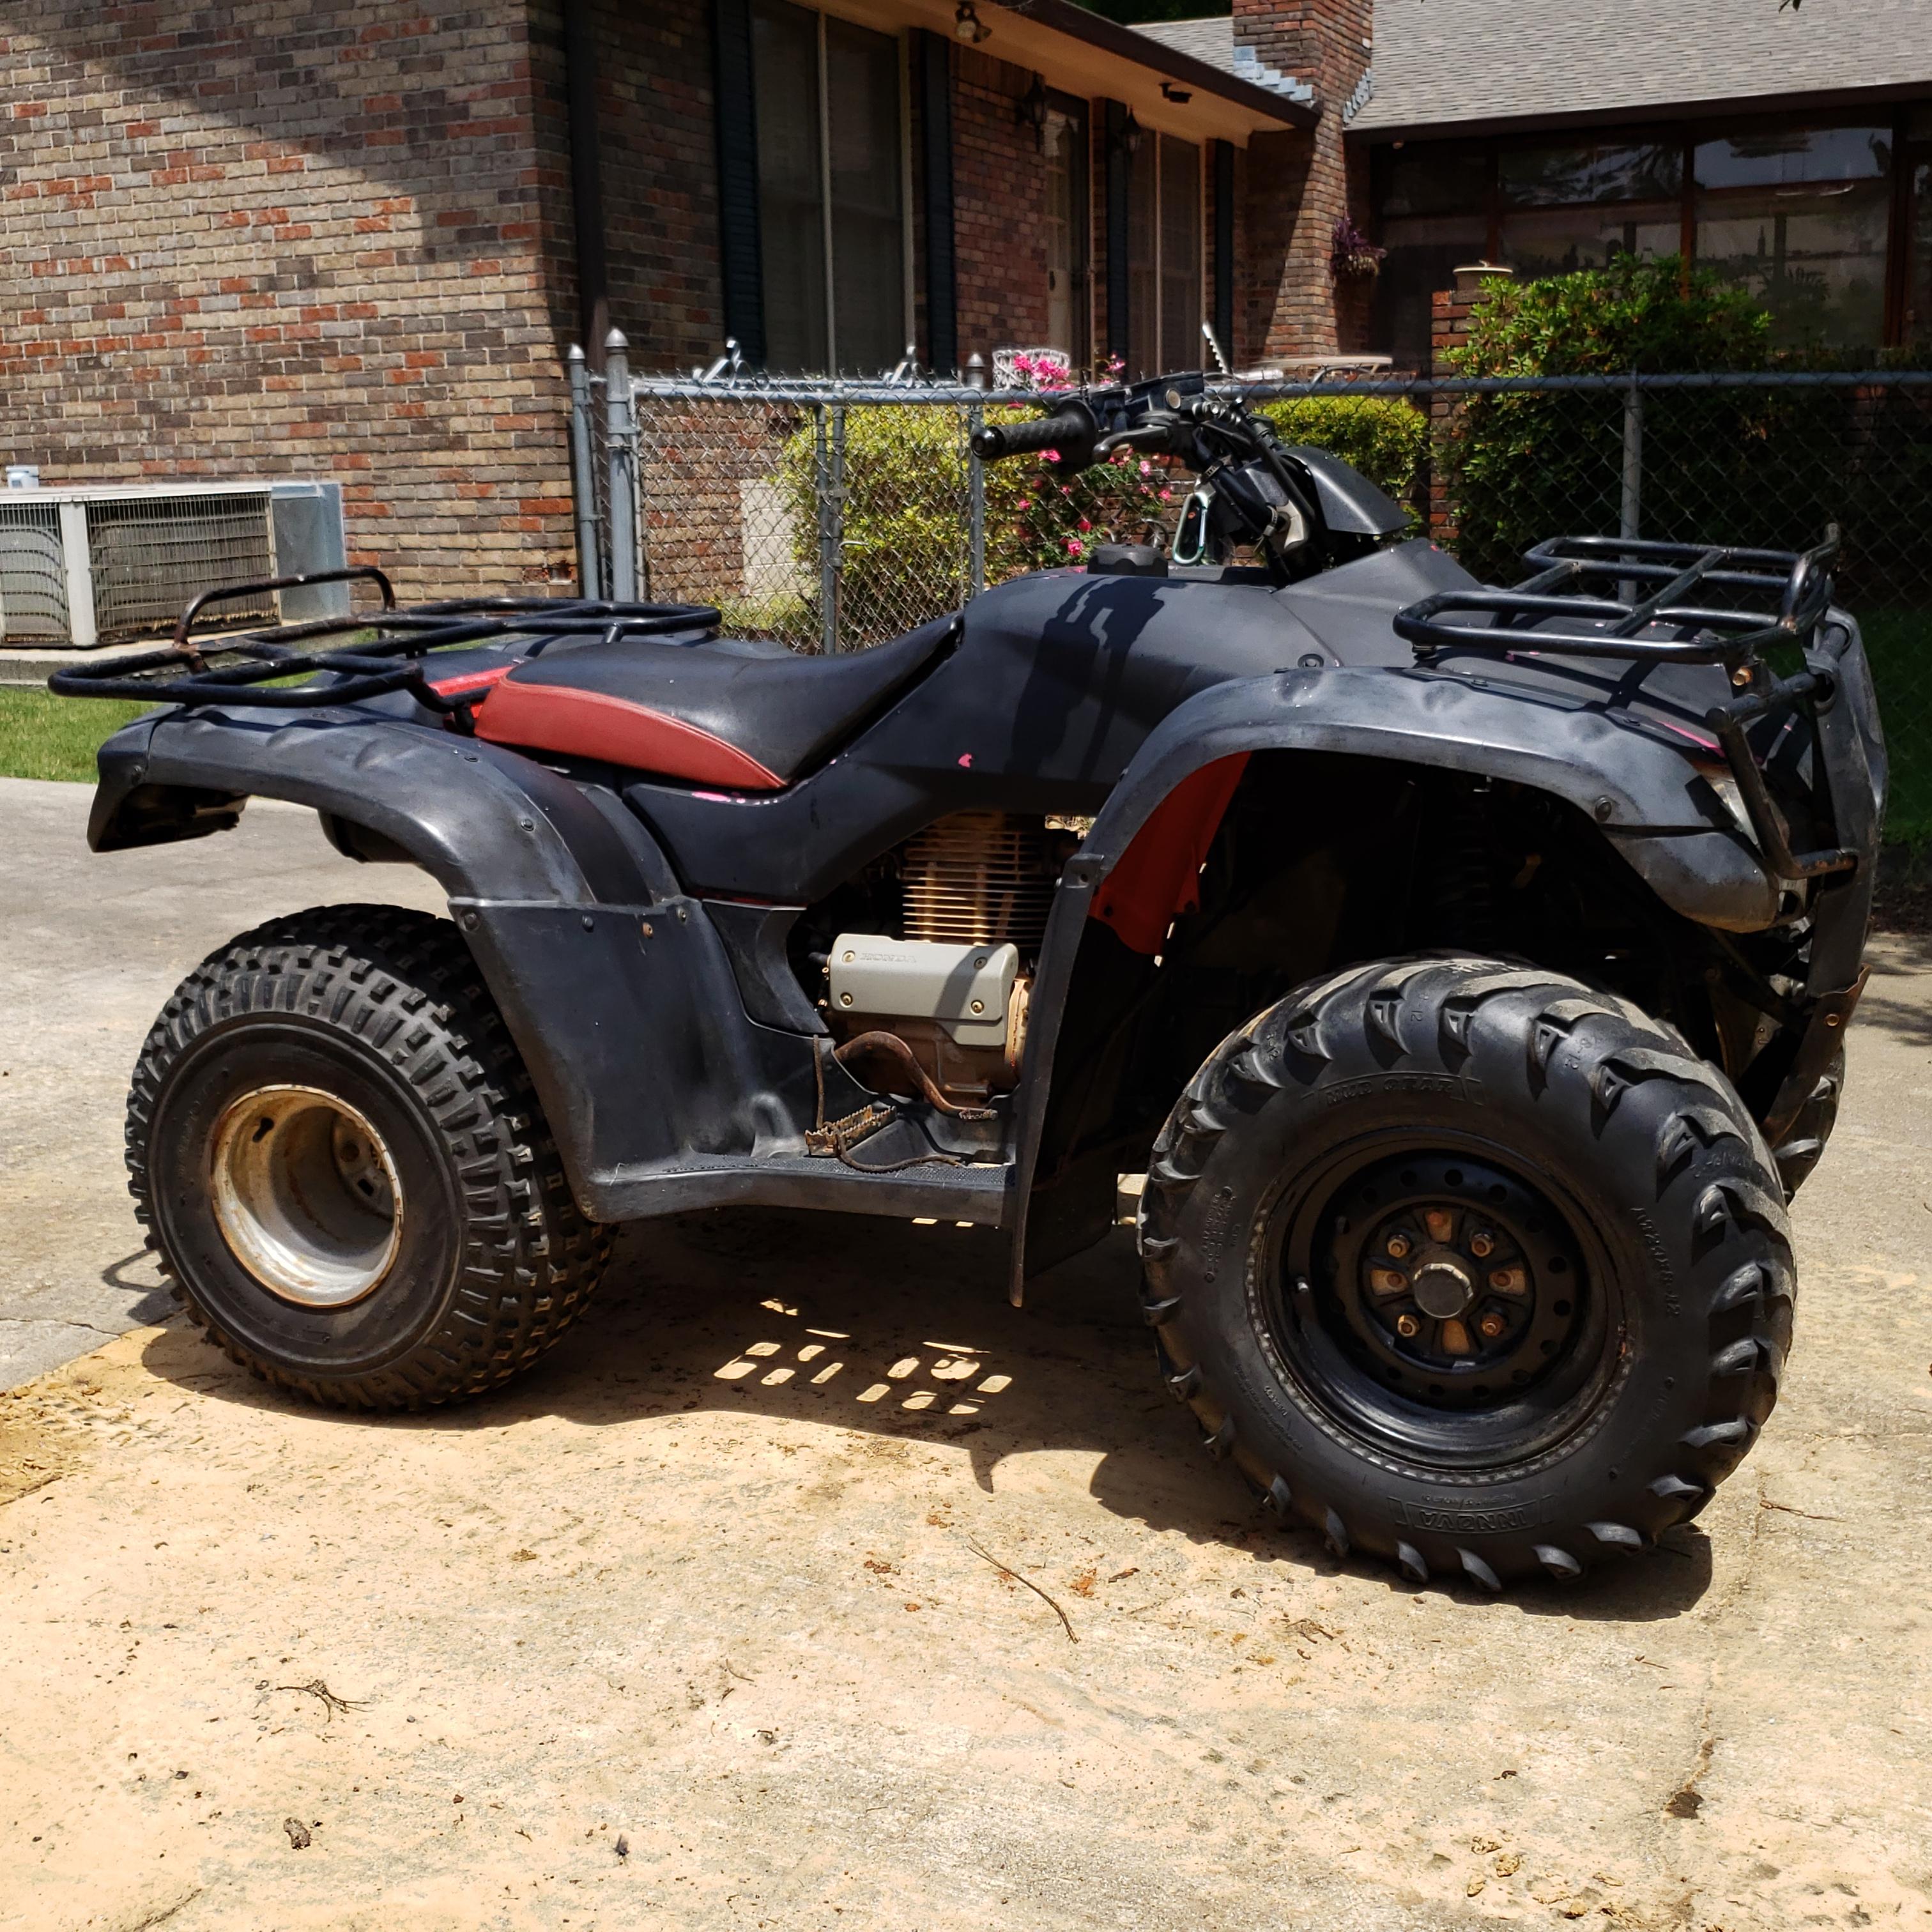 2005 Honda rancher 350 4x4 front drive shaft help-20190430_120541_1557504940595.jpg